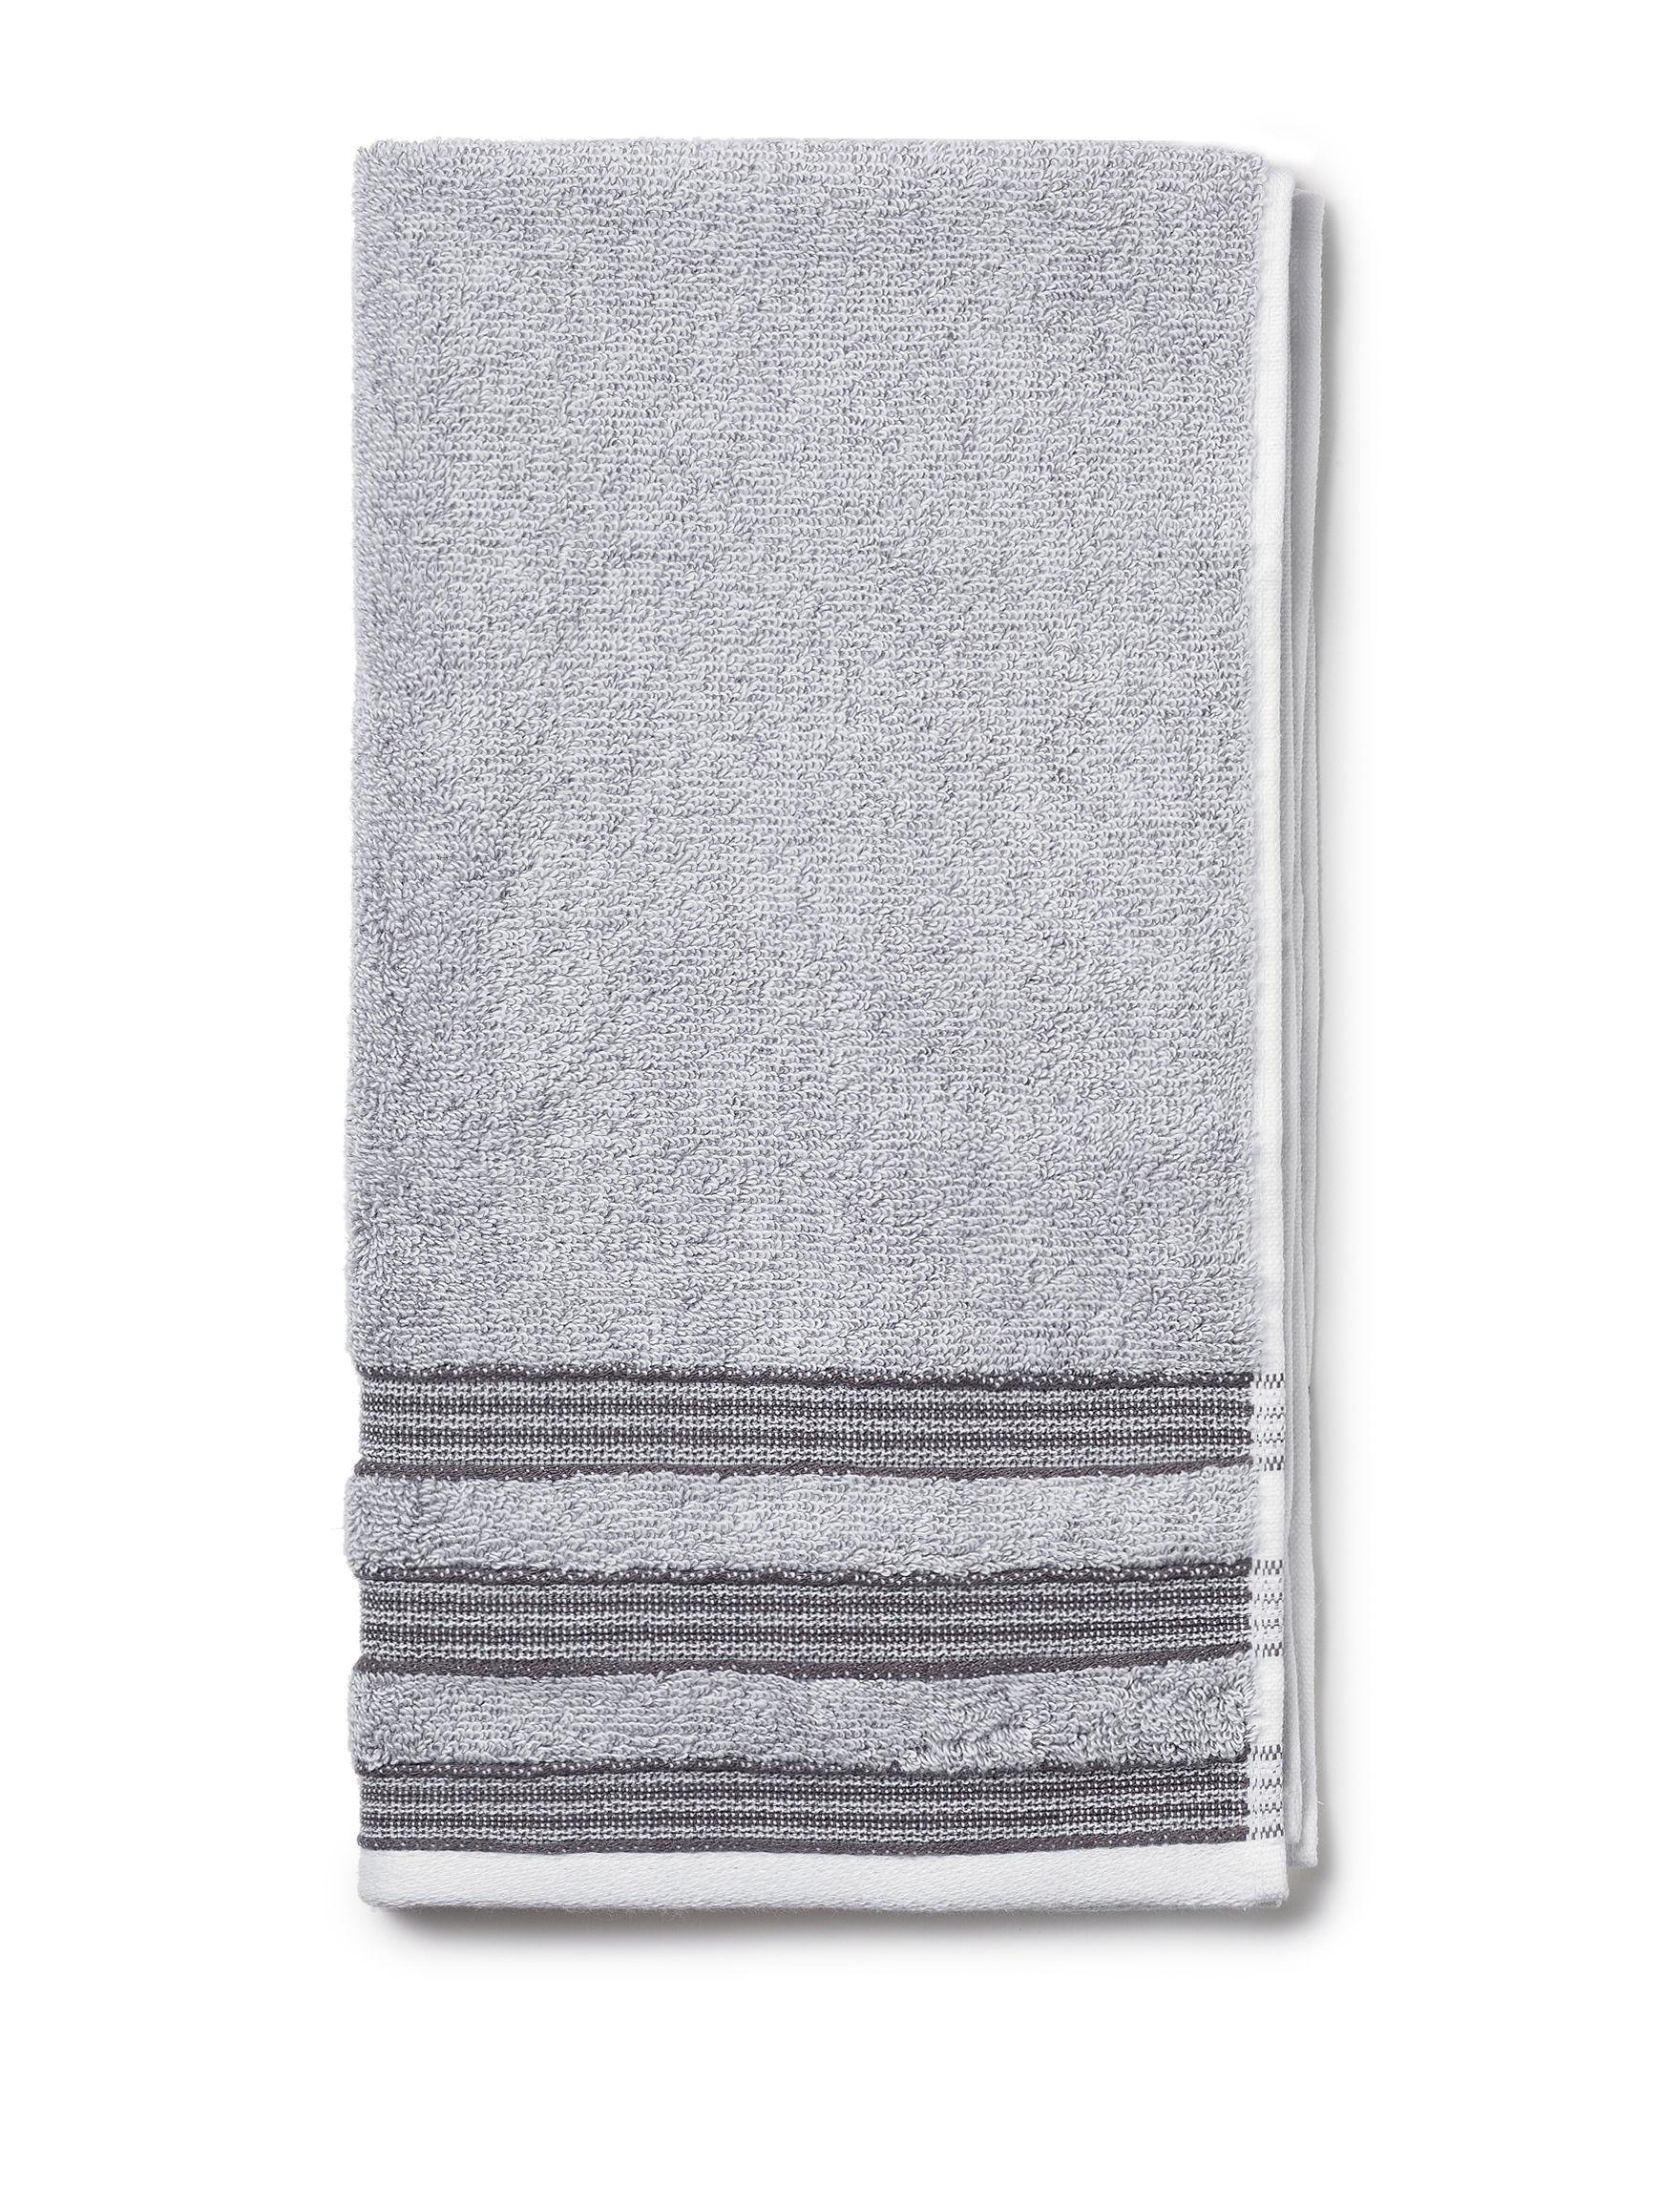 Izod Dark Grey Hand Towels Towels